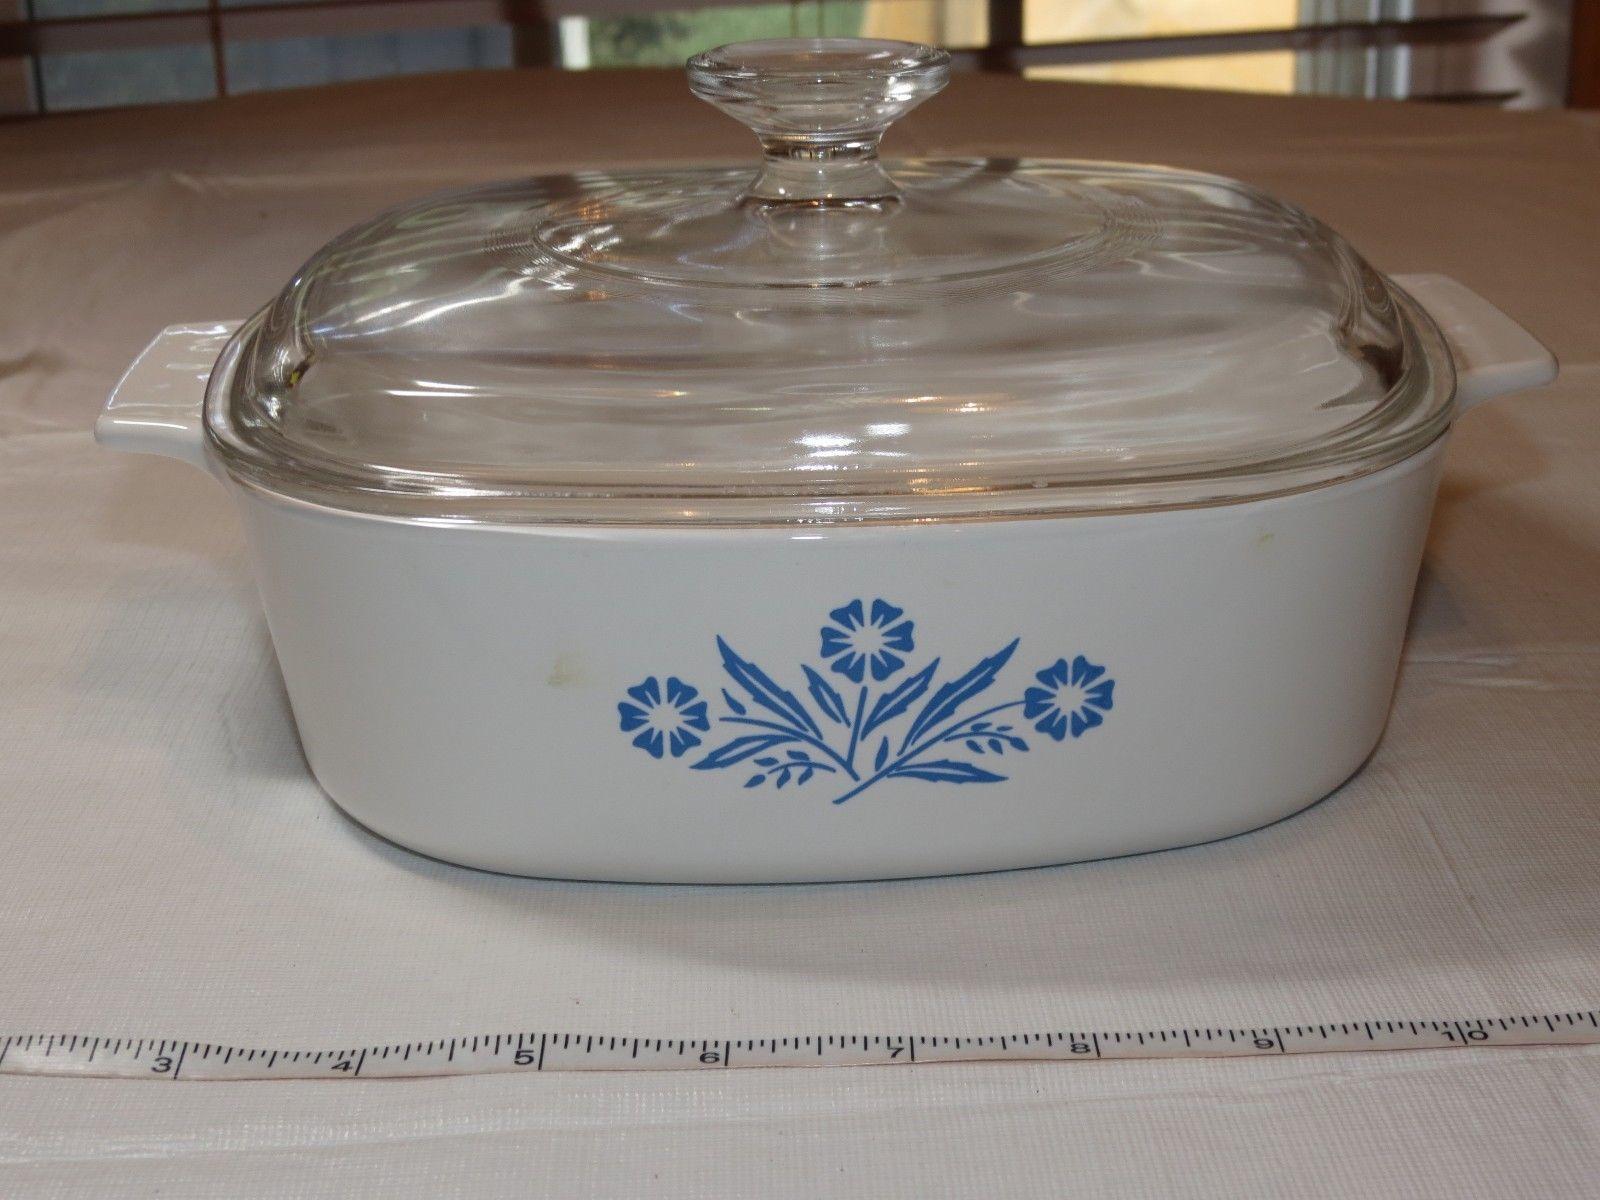 Pyrex Corning Ware Cornflower Blue Sauce Pan Casserole